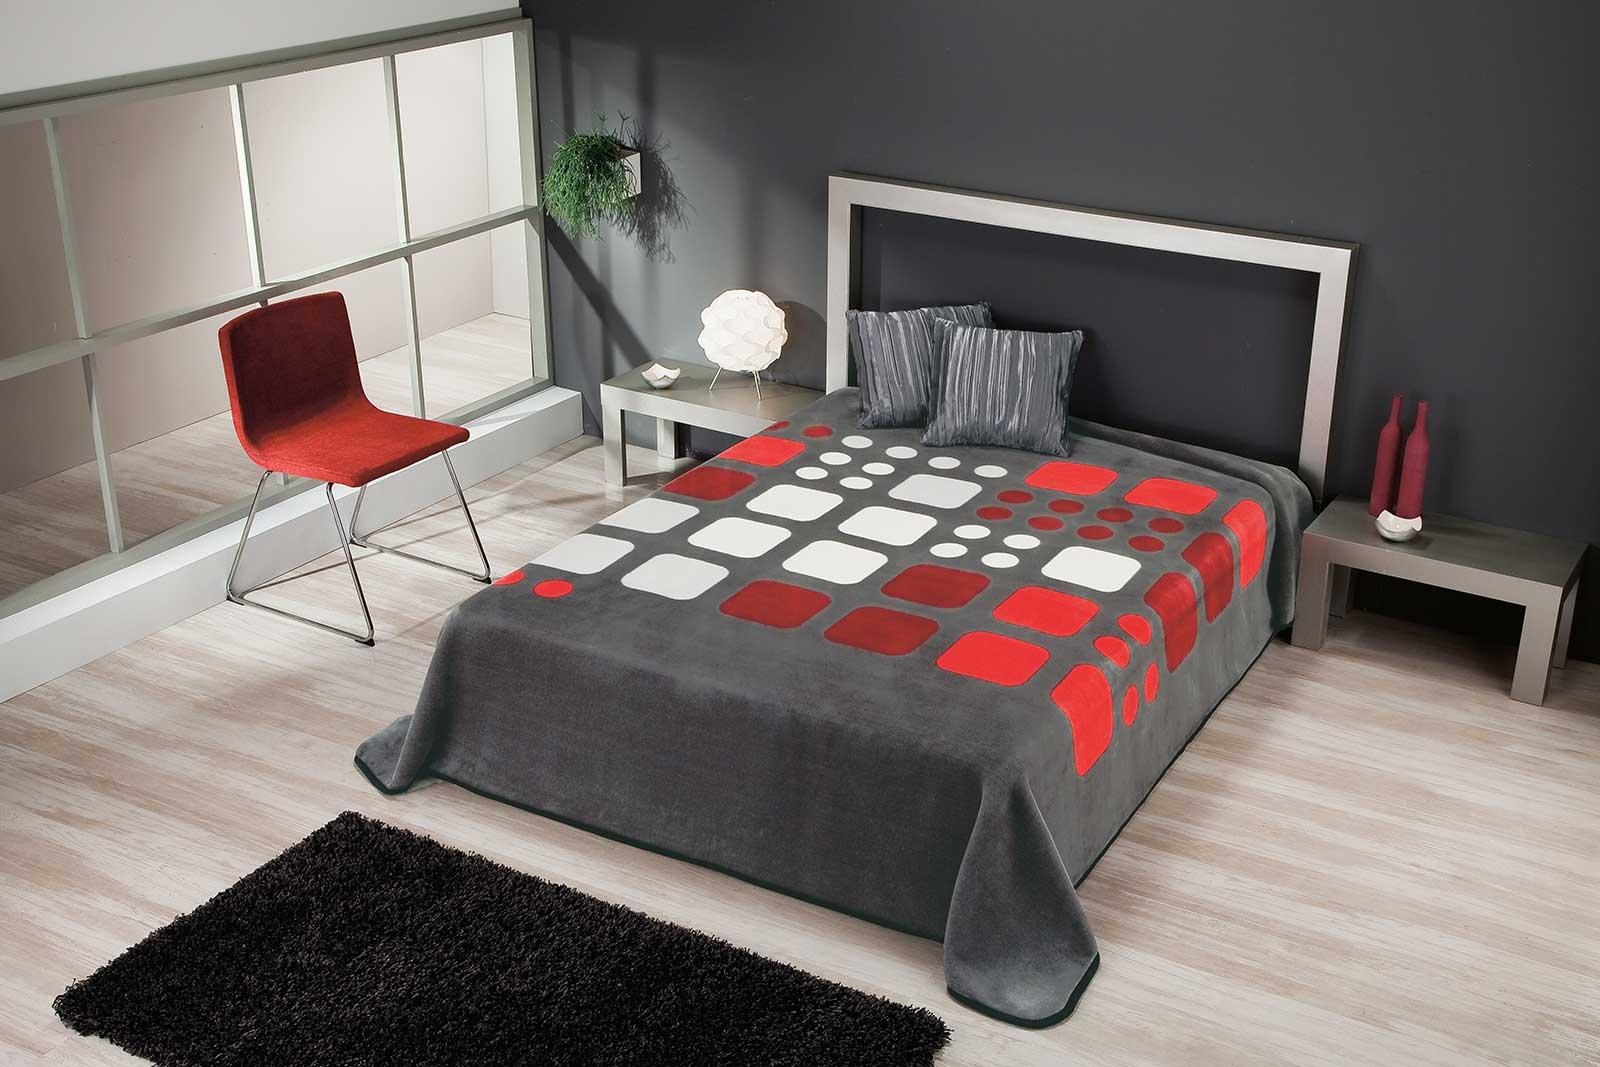 Granate Black Color Blanket